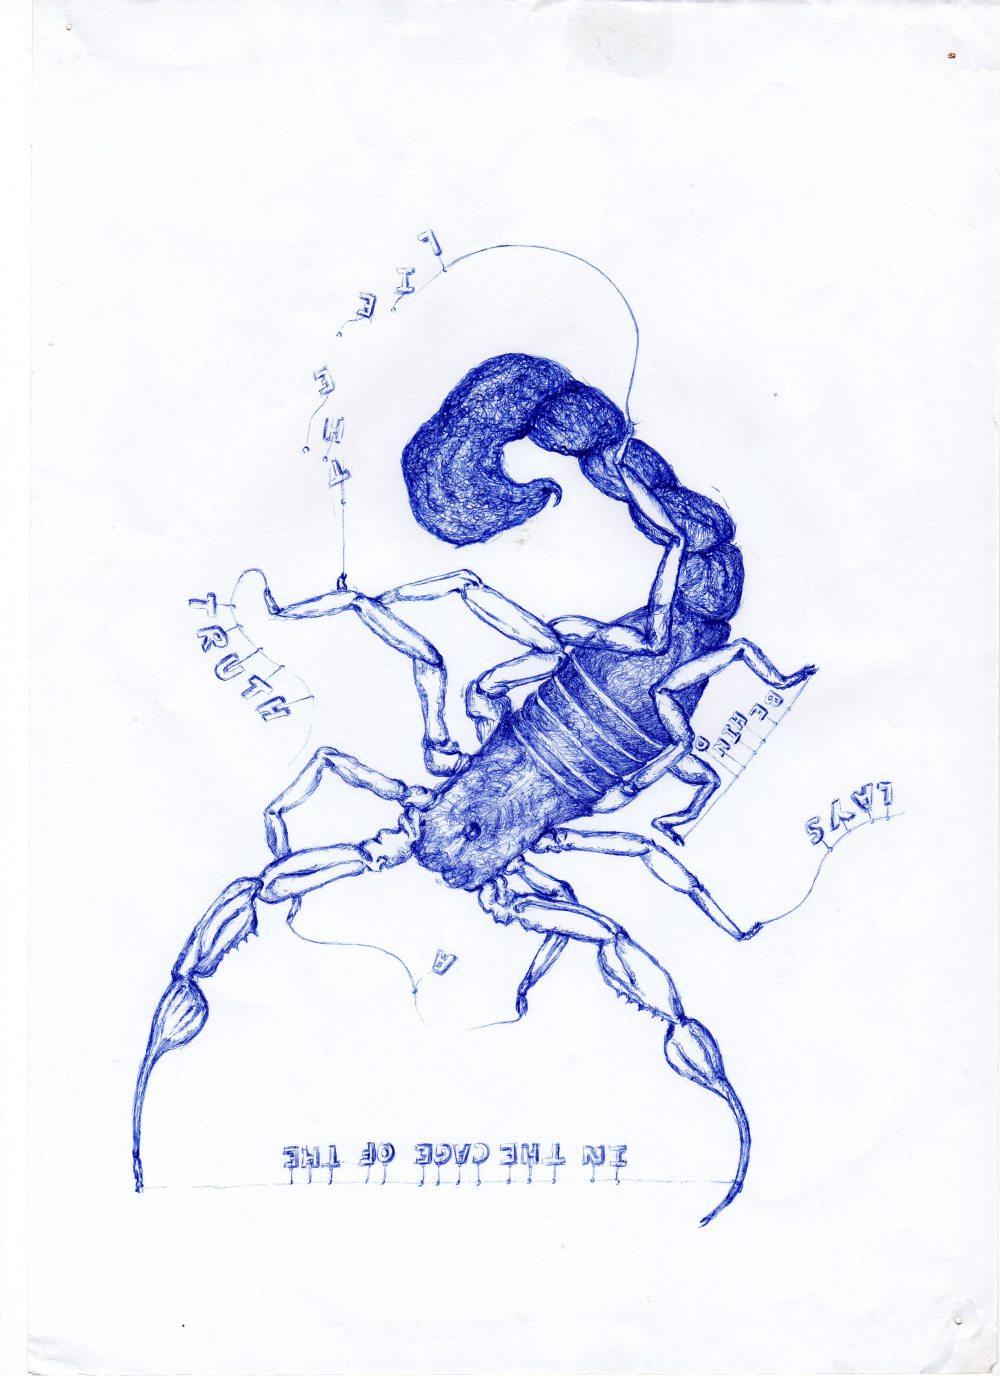 elescorpionazul